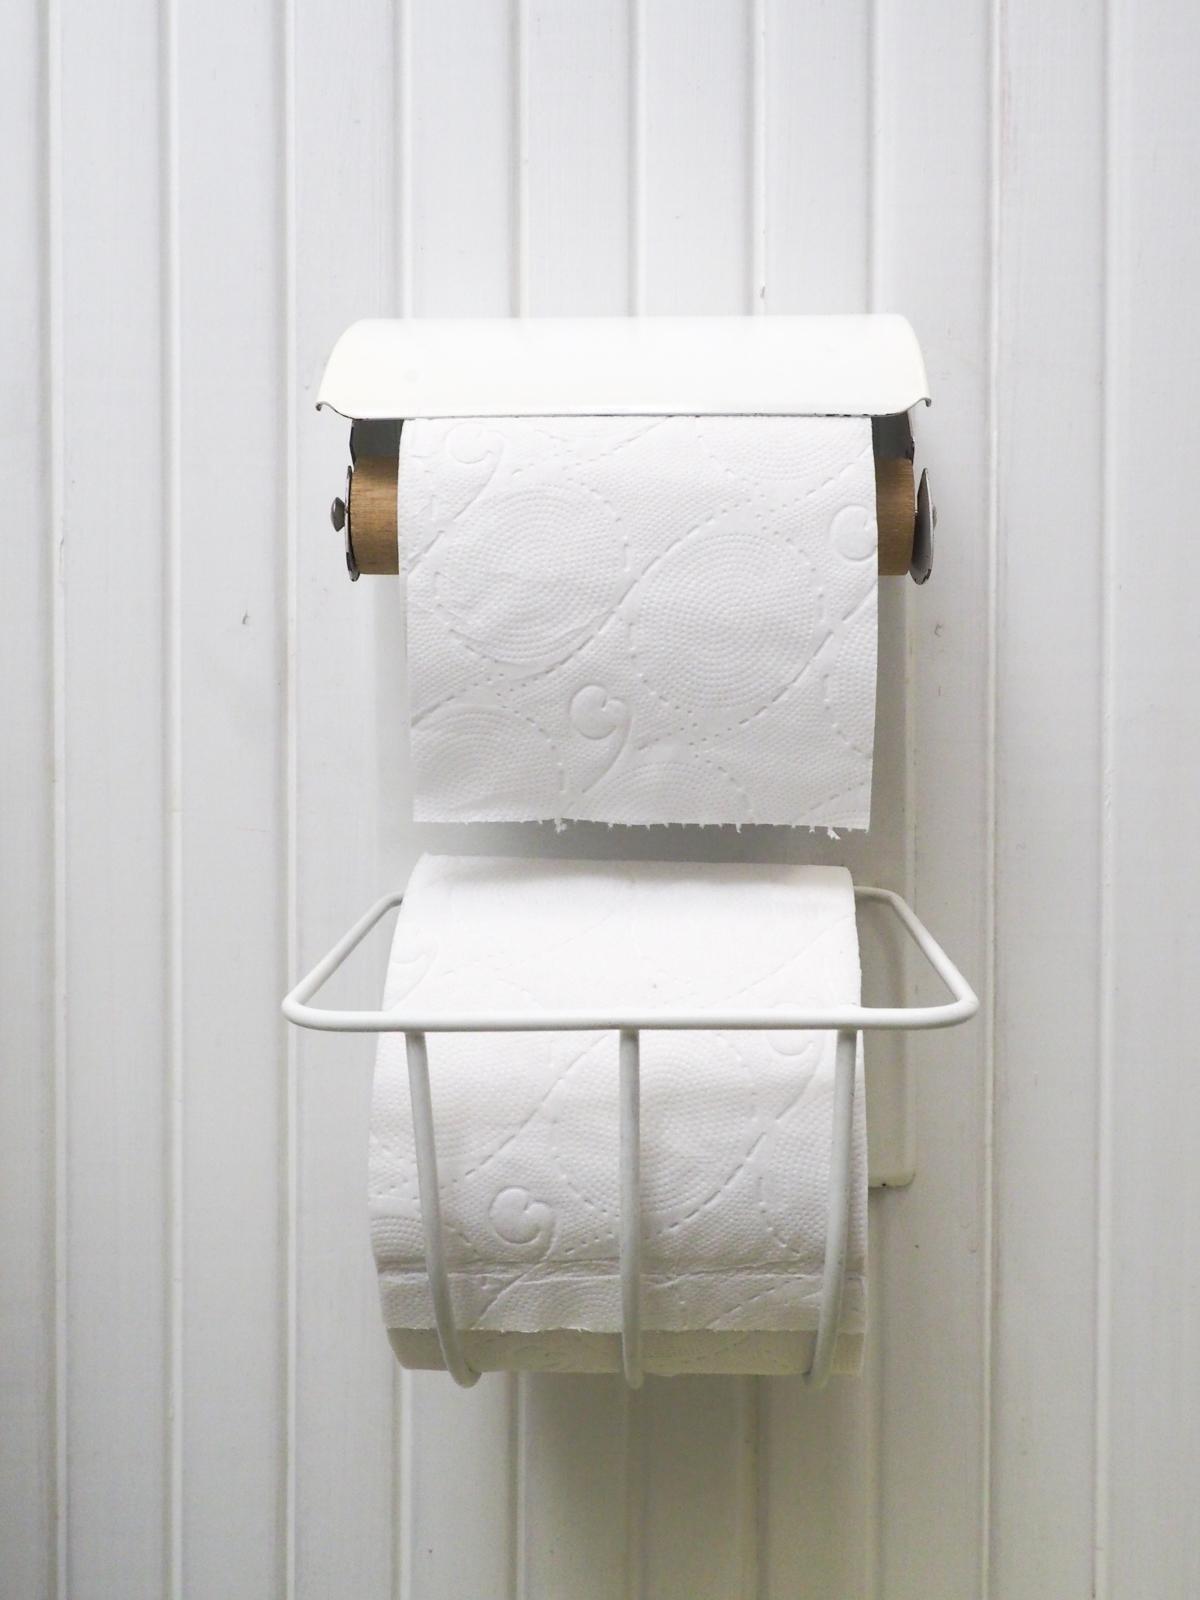 vanha wc paperiteline